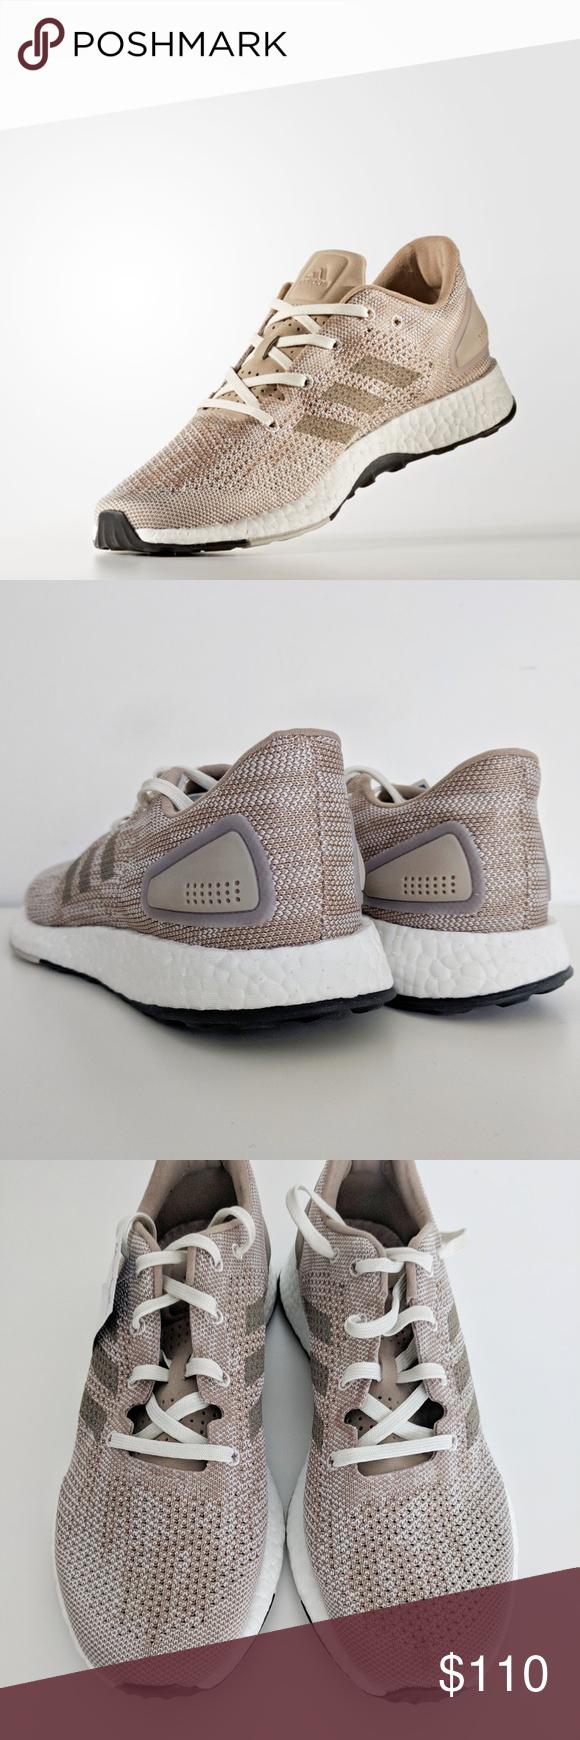 383cfd83b2616 Adidas Men s PureBoost DPR Running Shoe Beige Sz 9 Adidas Men s Size 9  PureBoost DPR Running Shoe - Trace Khaki S82013 Mens Adidas PureBOOST DPR -  S82013 ...